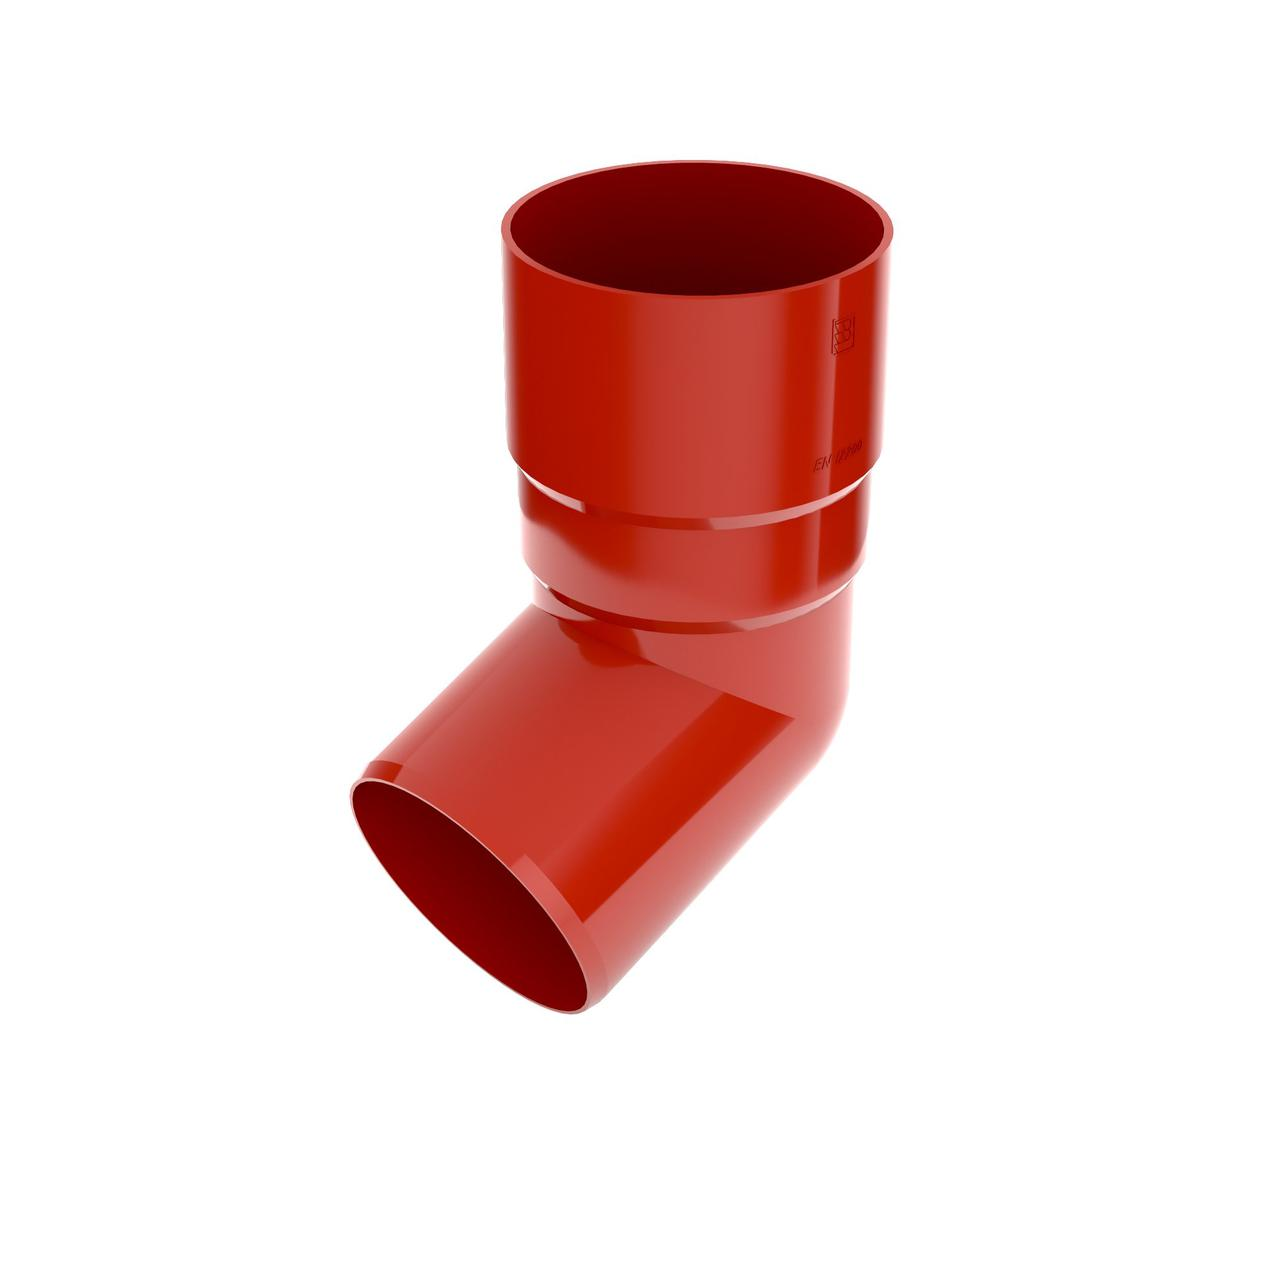 Коліно труби Колено 90 мм Водосточная система BRYZA Бриза ПВХ Польща красный 3011